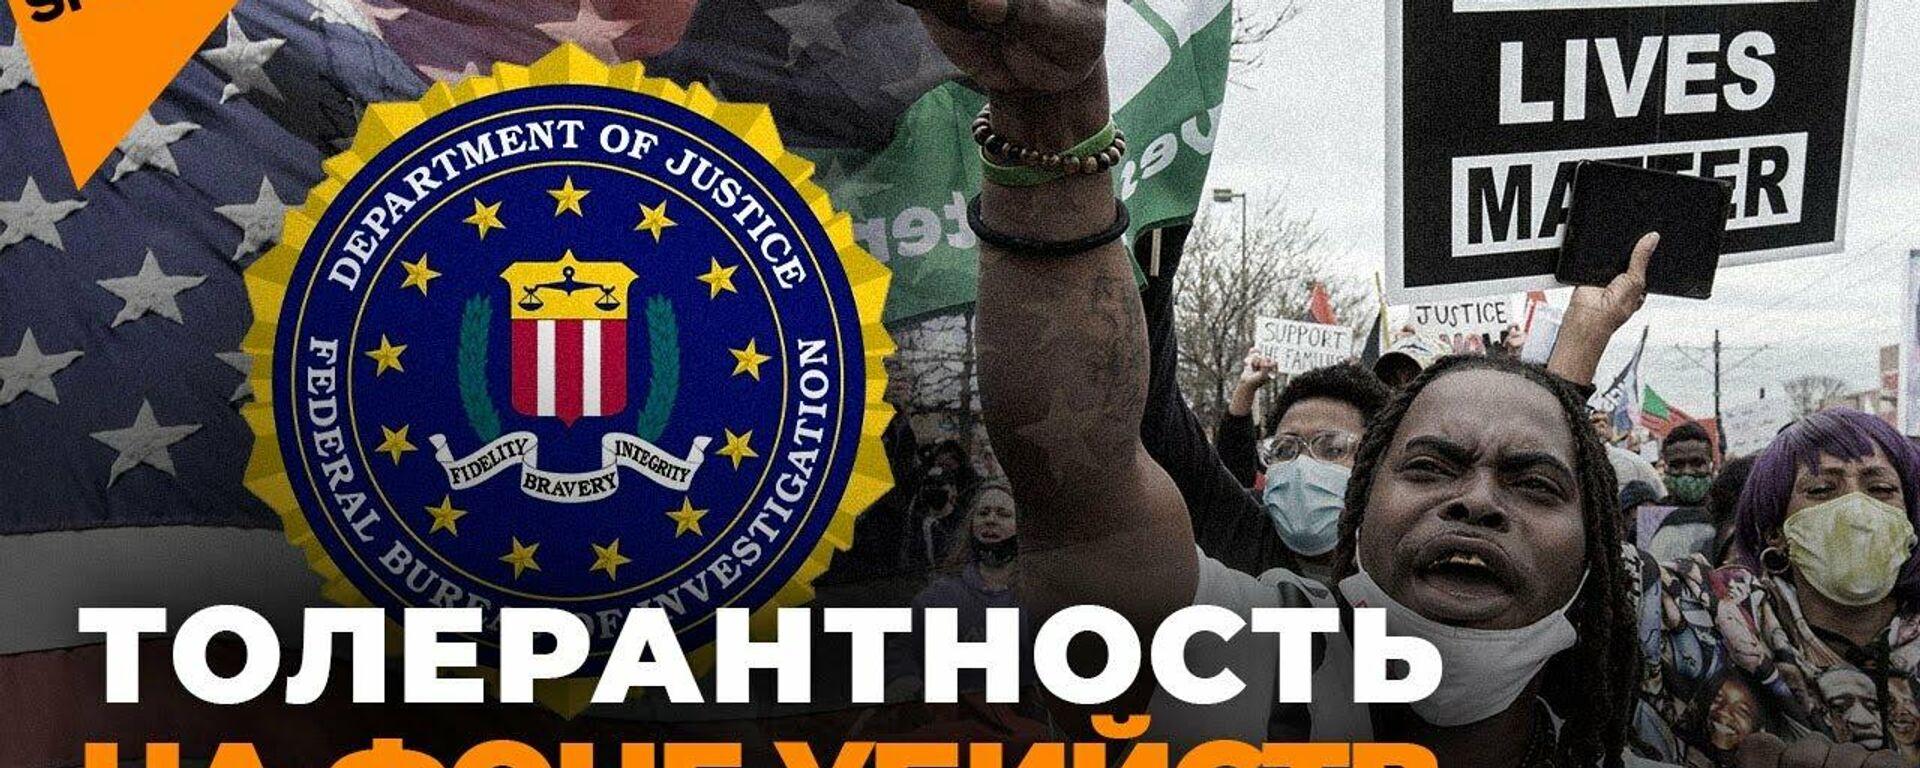 Спасет ли США от криминала директор по гендерному разнообразию ФБР?  - Sputnik Узбекистан, 1920, 27.04.2021